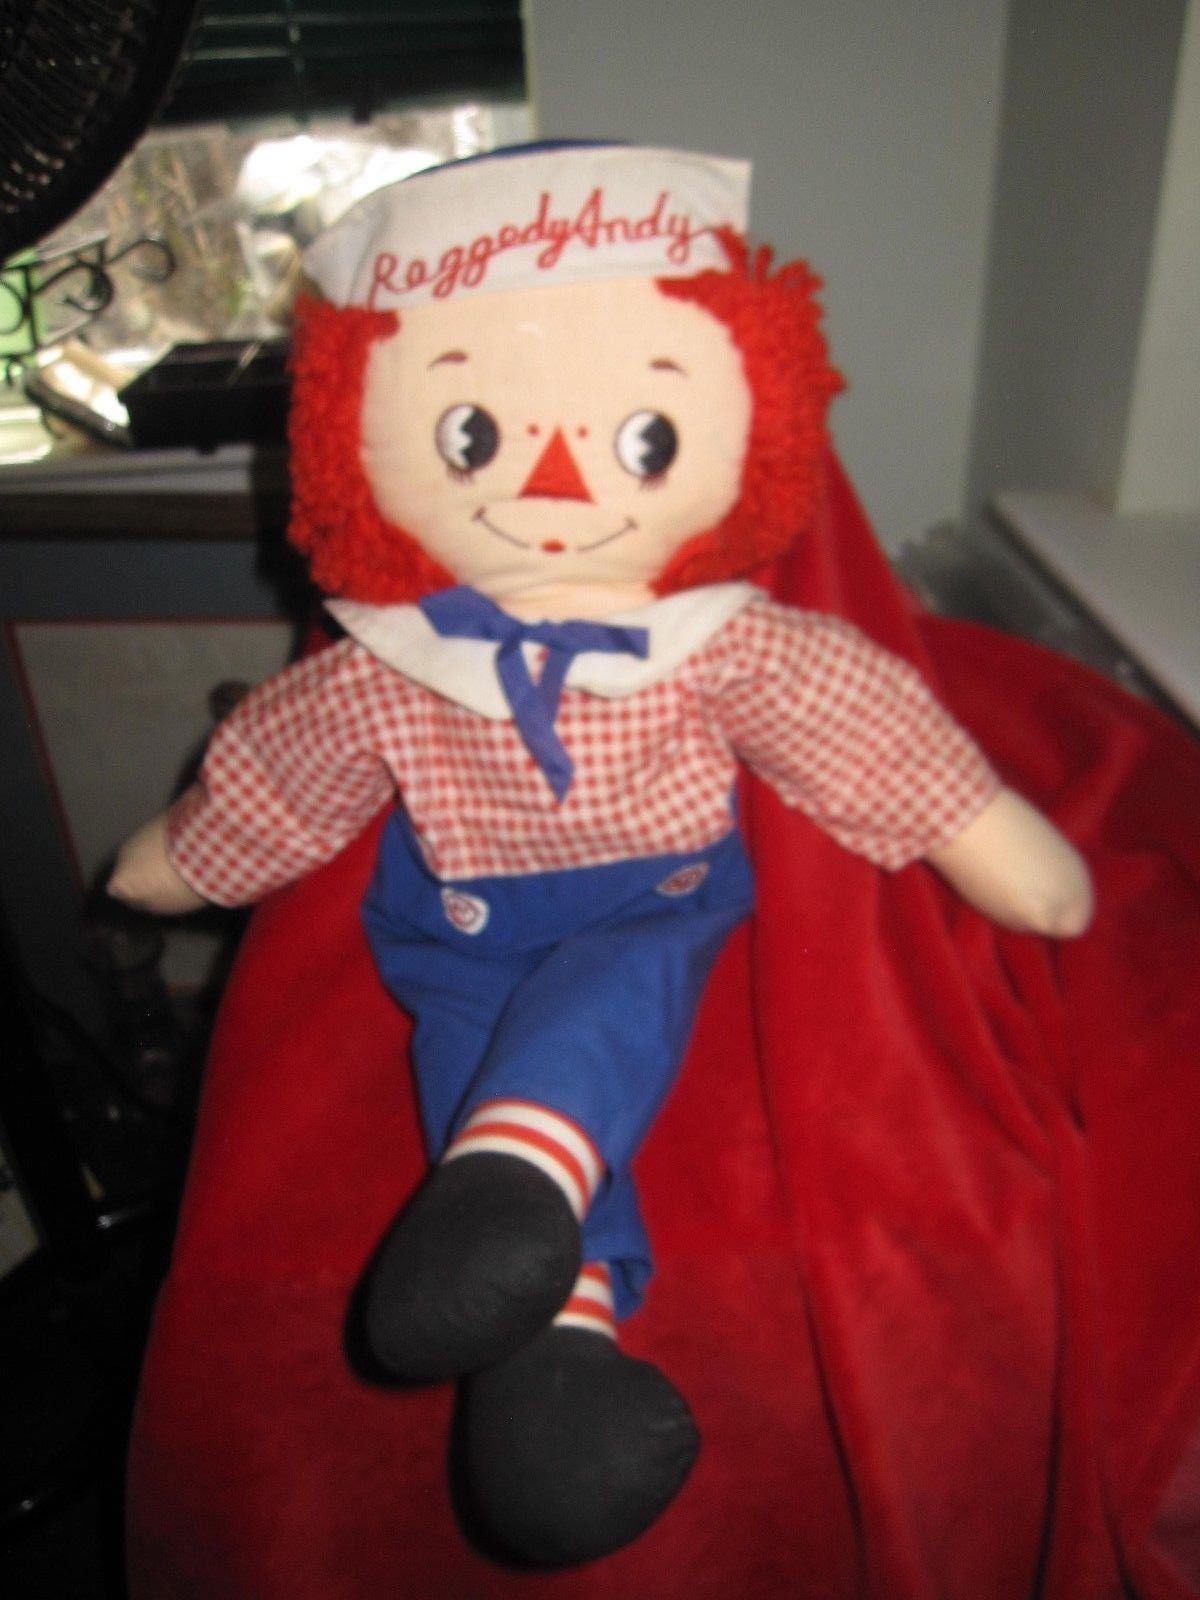 "Raggedy Andy Kinckerbocker 17"" Doll"